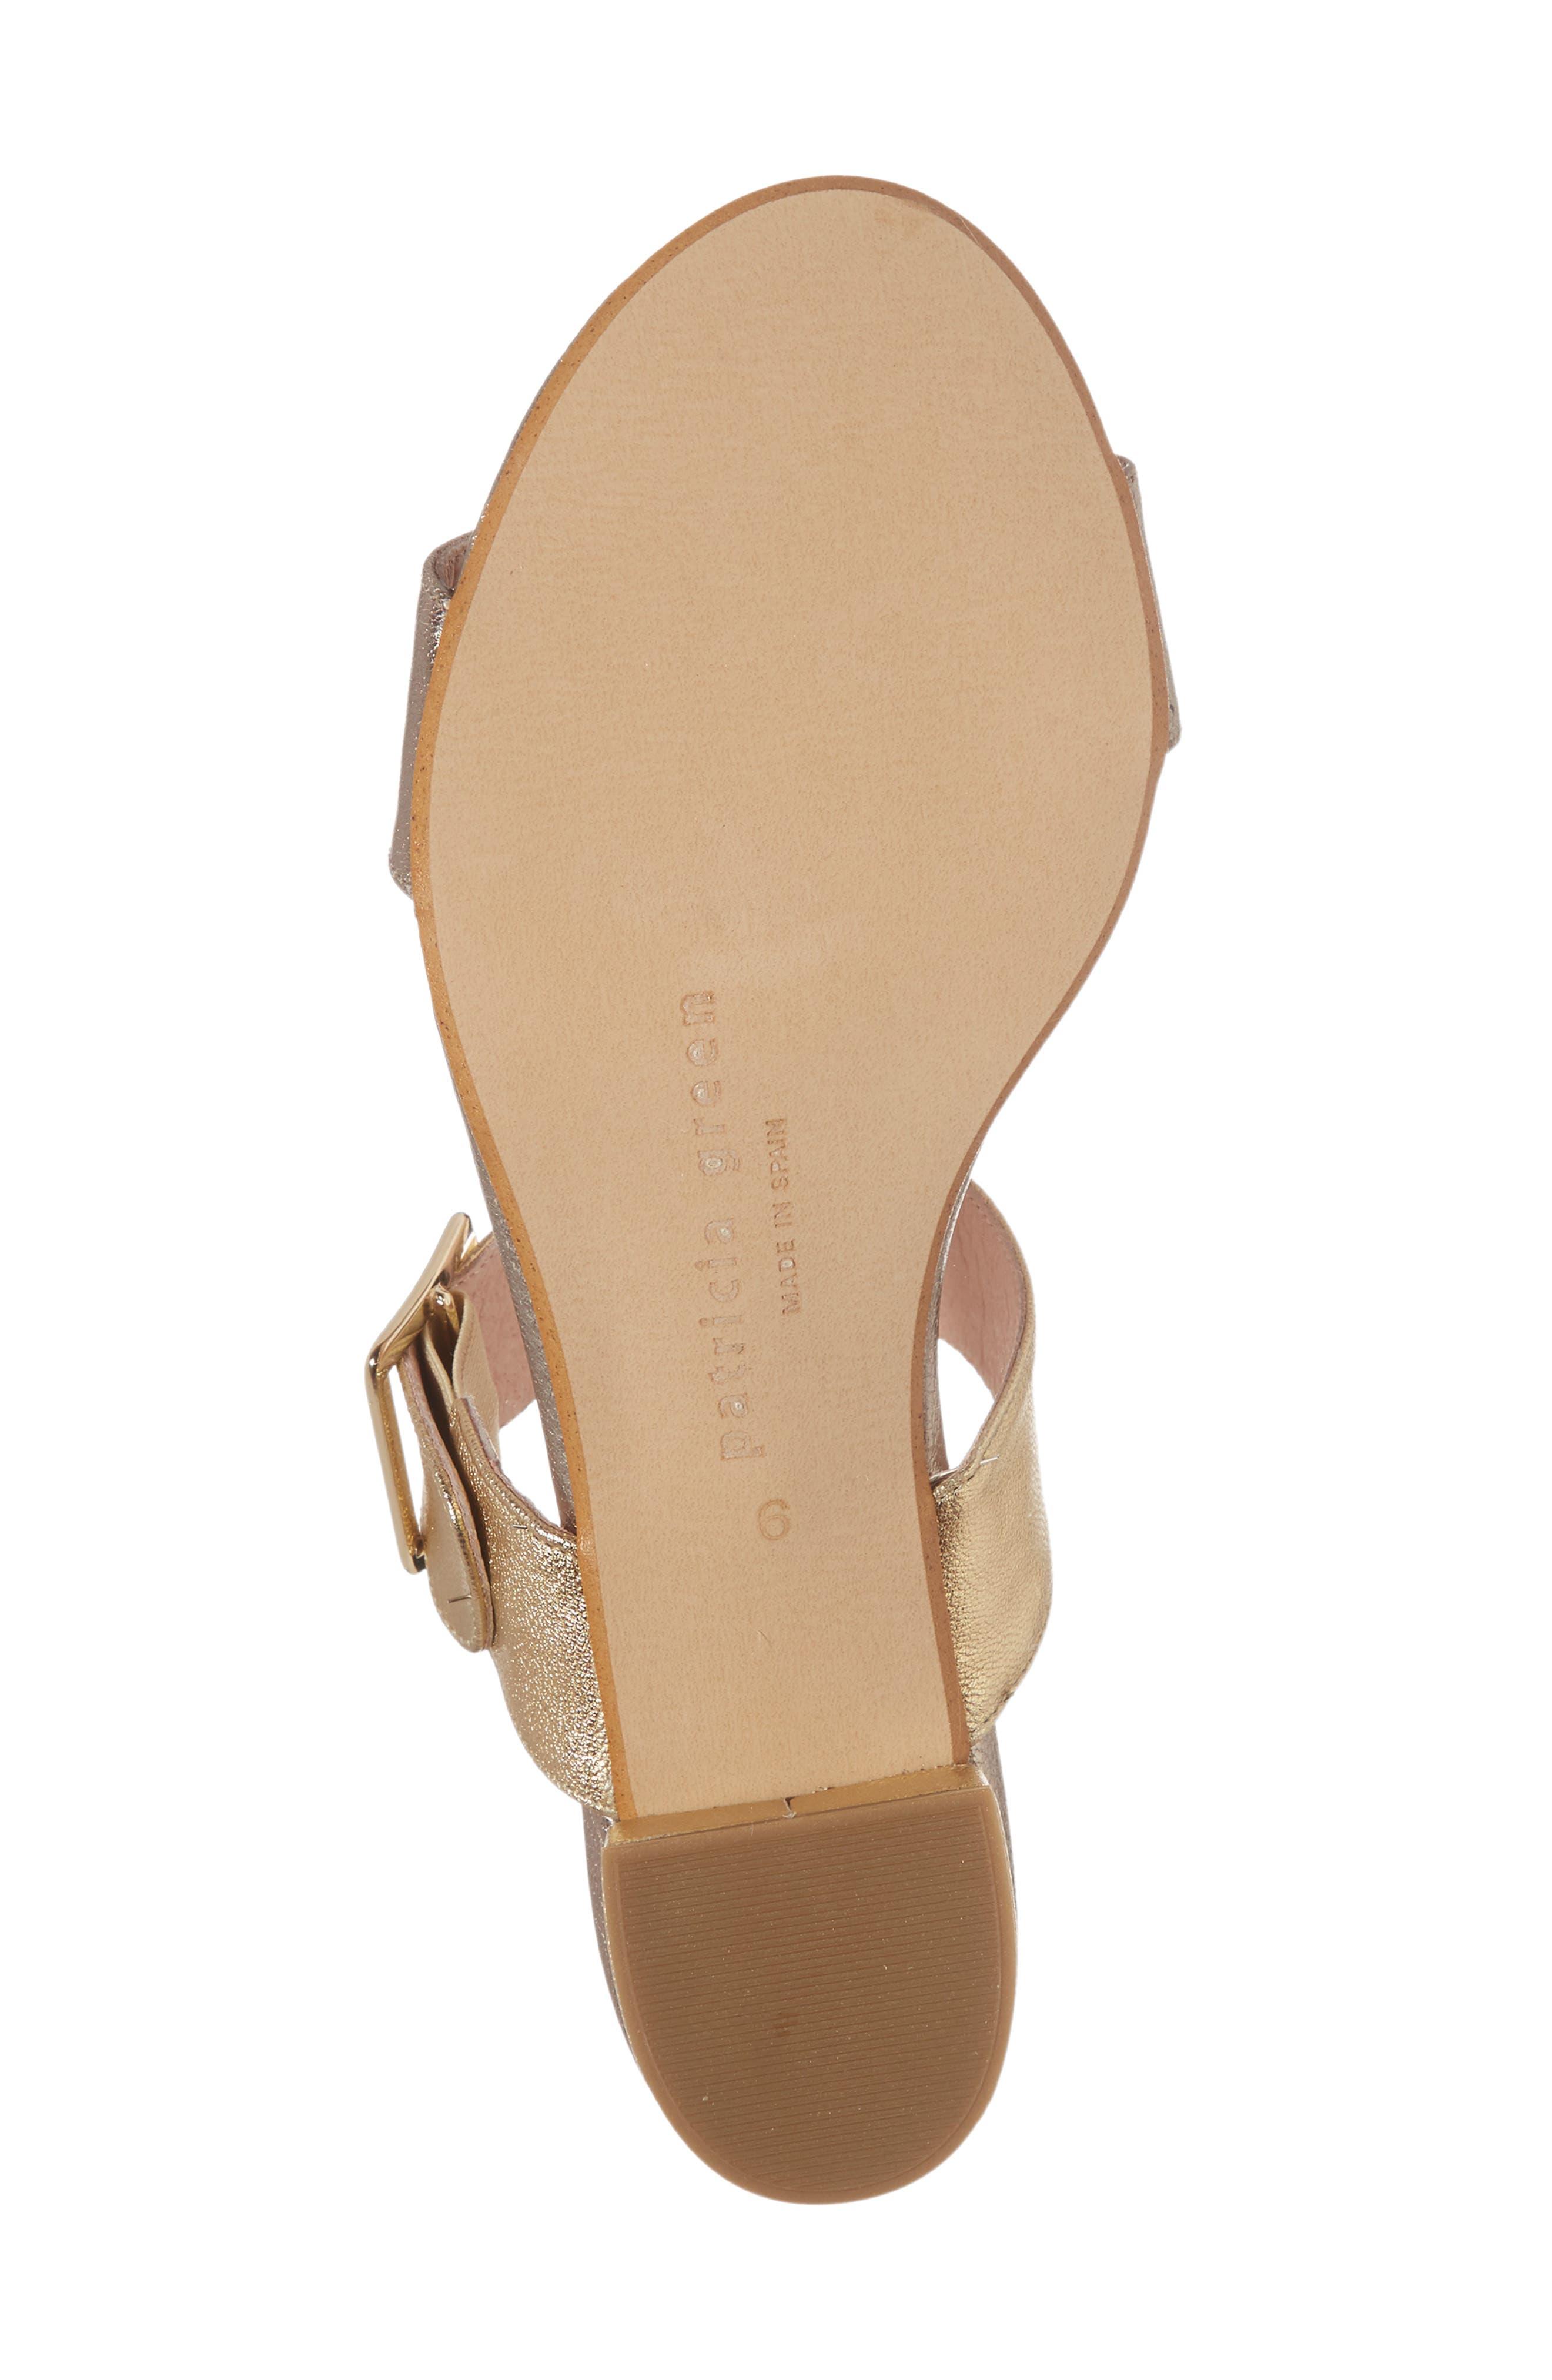 Ruth Slide Sandal,                             Alternate thumbnail 6, color,                             Gold/ Bronze Leather